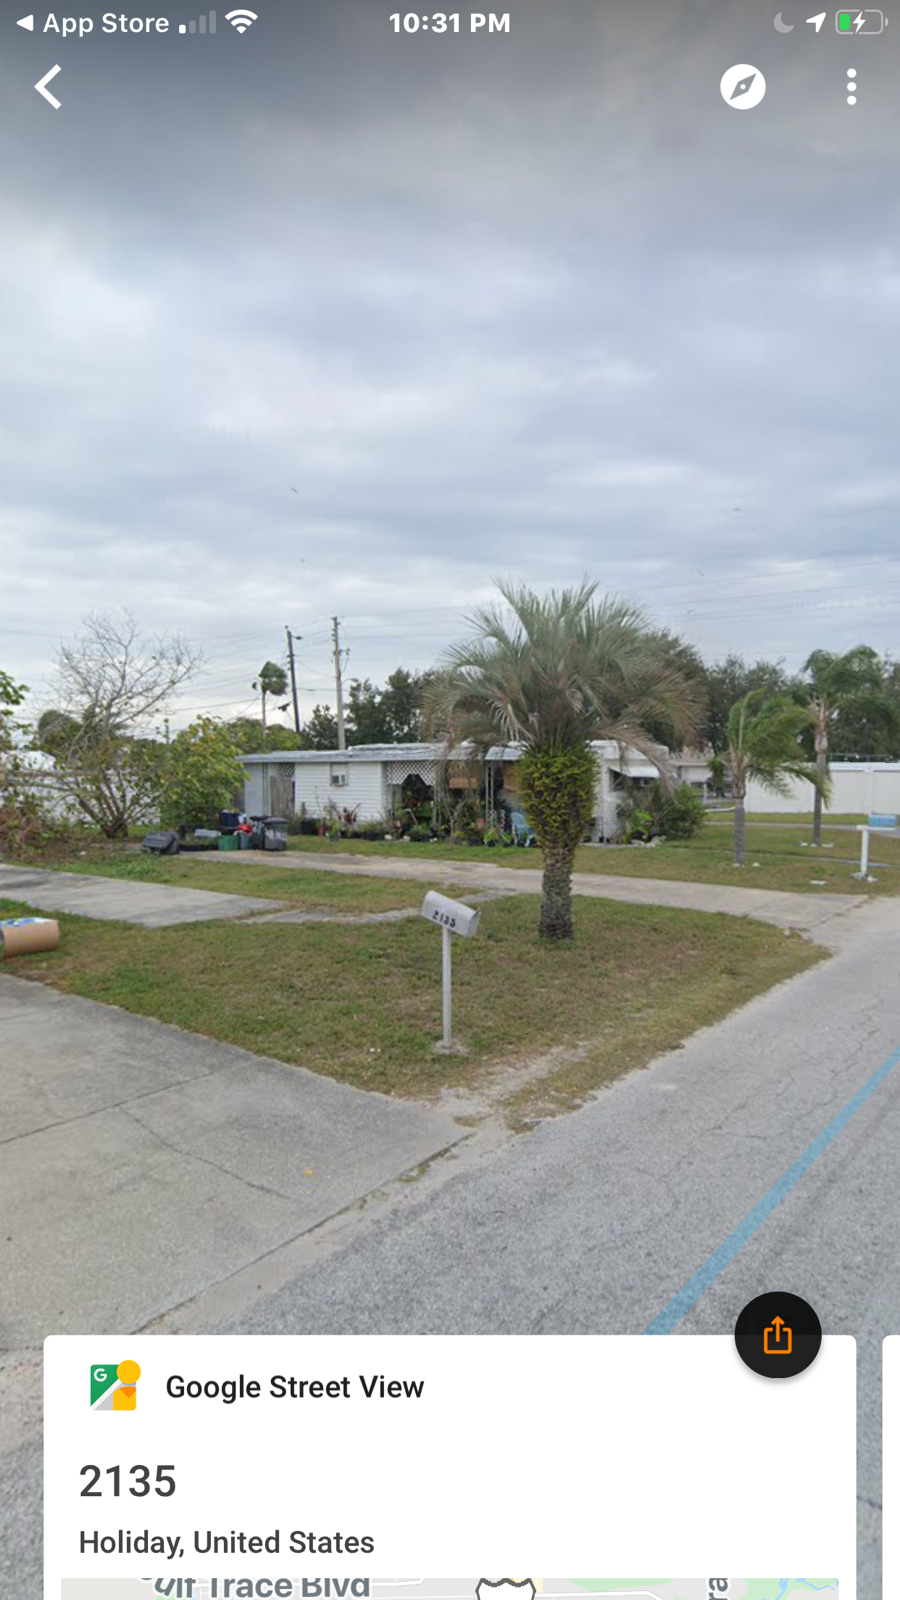 MOBILE HOME LOT 9 MIN.TO TARPON SPRINGS,FL. UTILITIES CONCRETE PADS, 2500 DOWN - $9,995.00